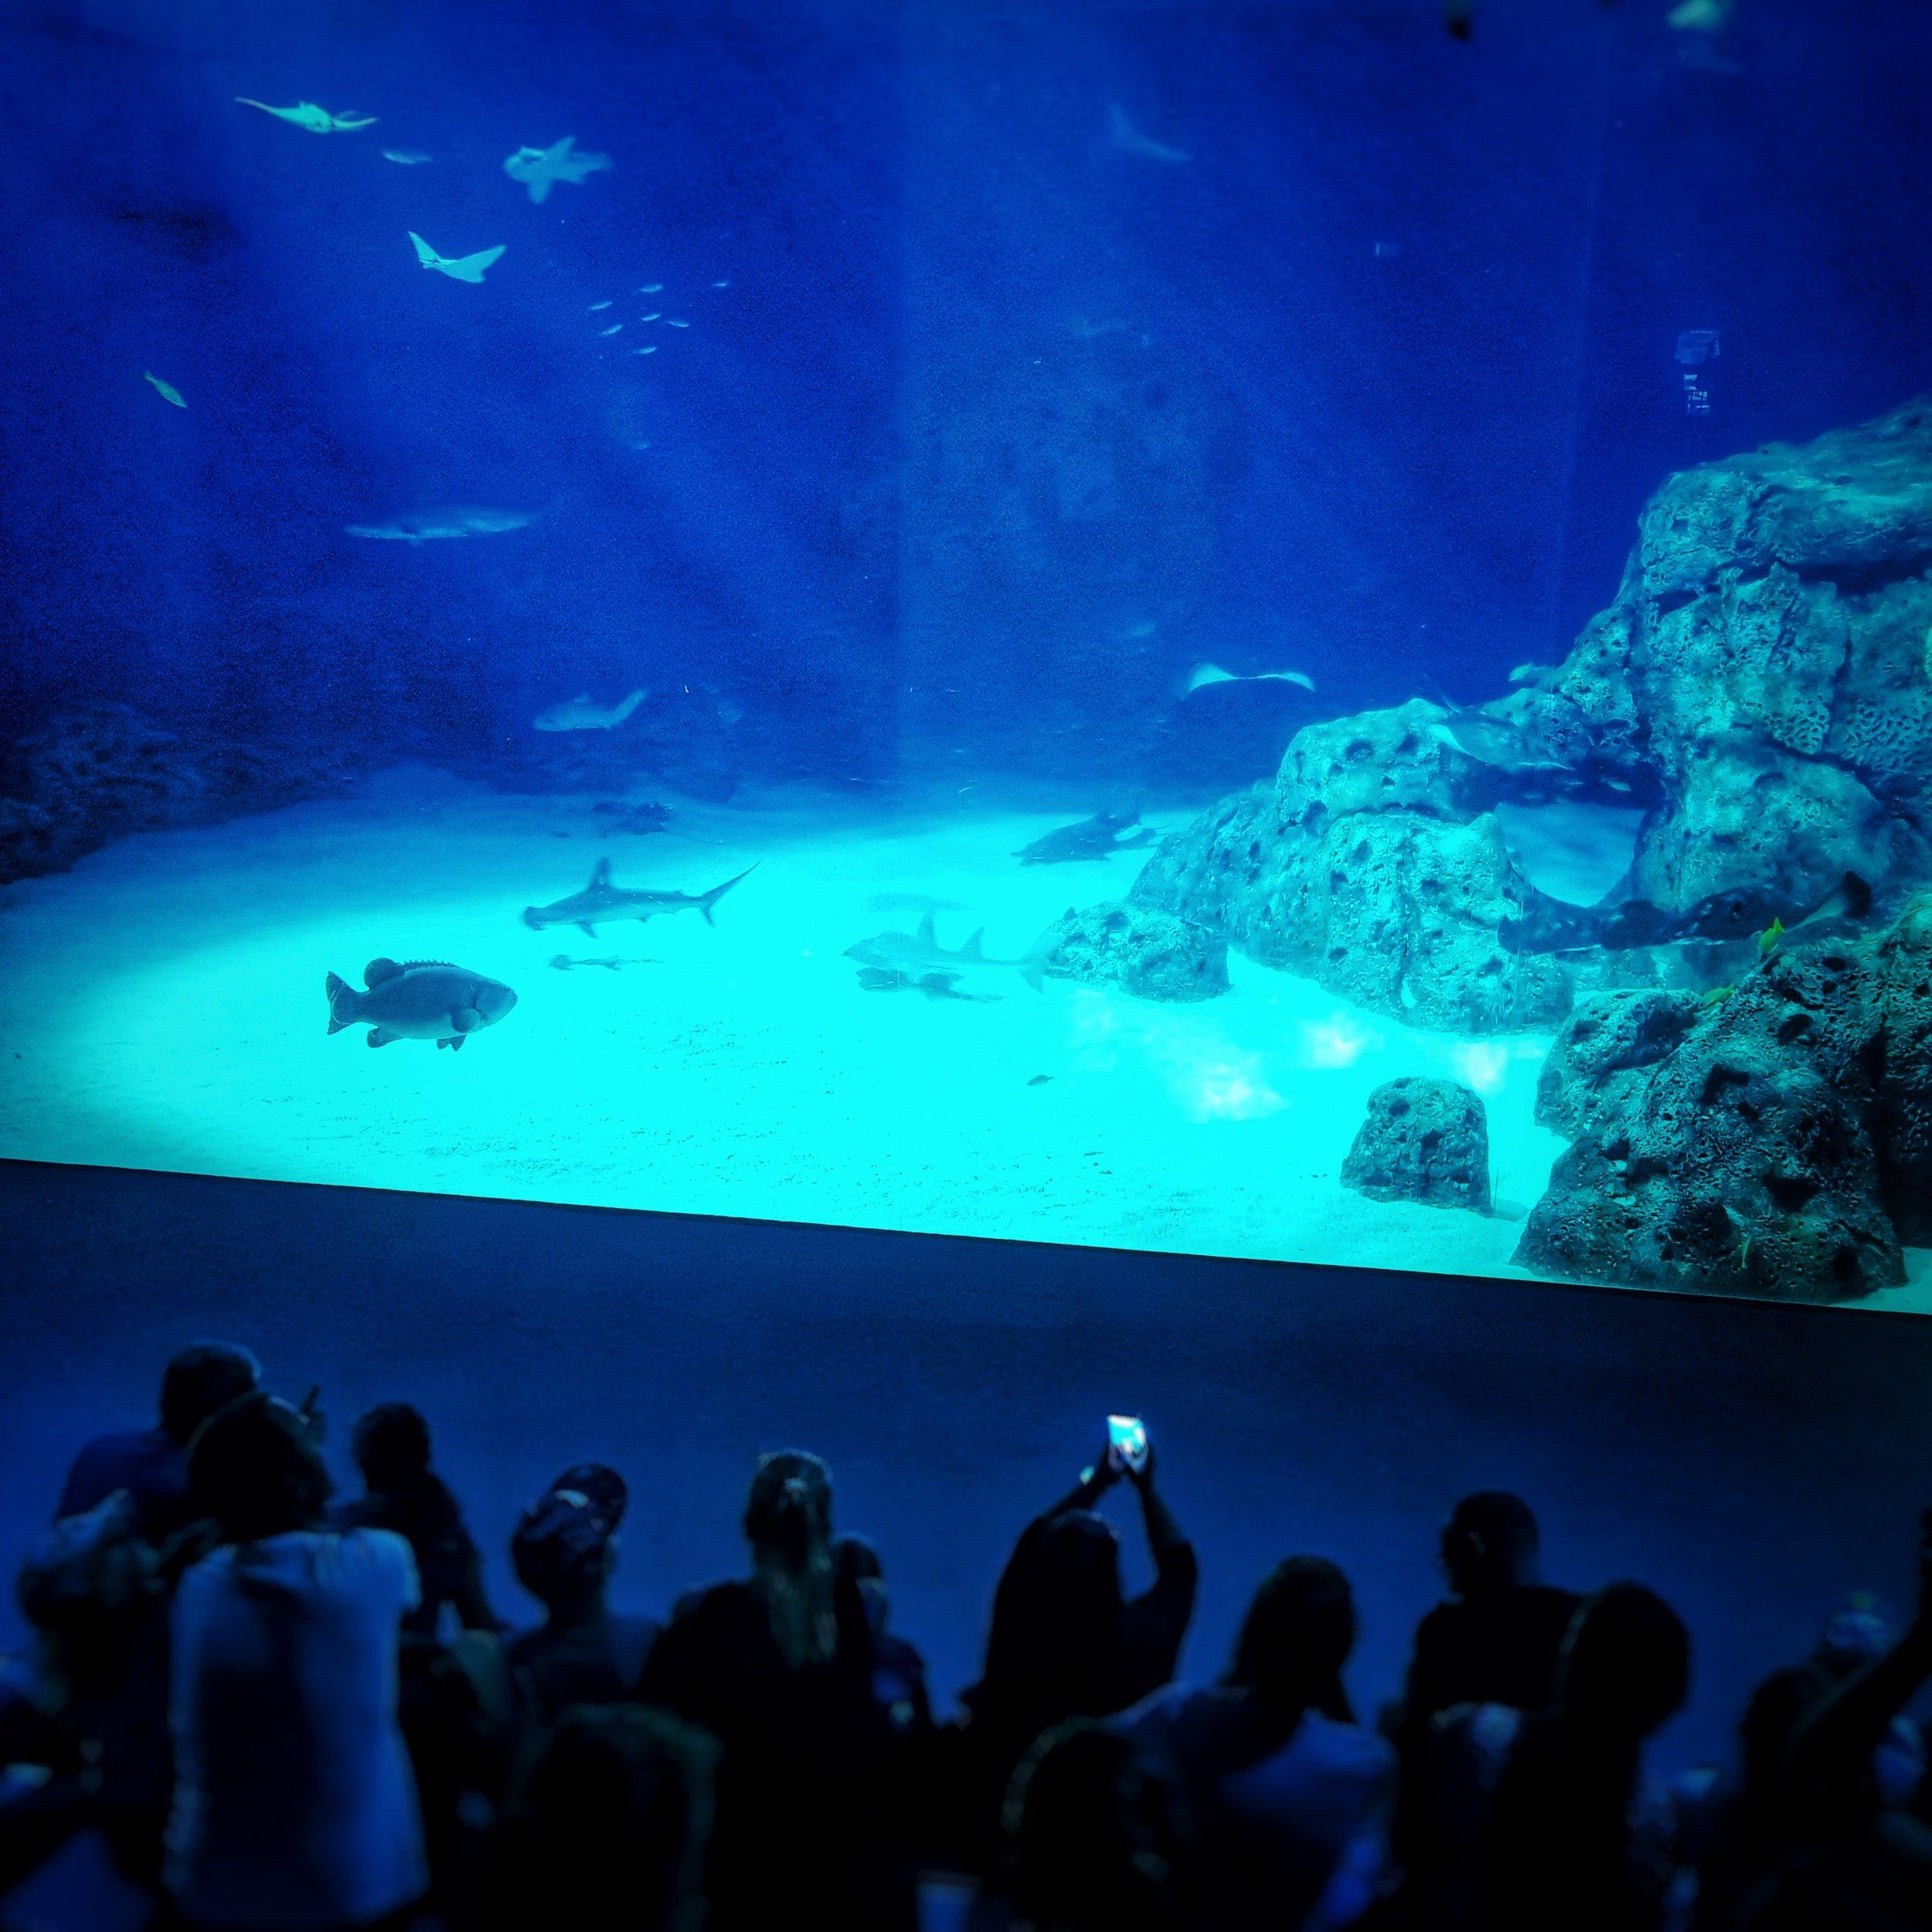 Day 221 - August 9: Ocean blue